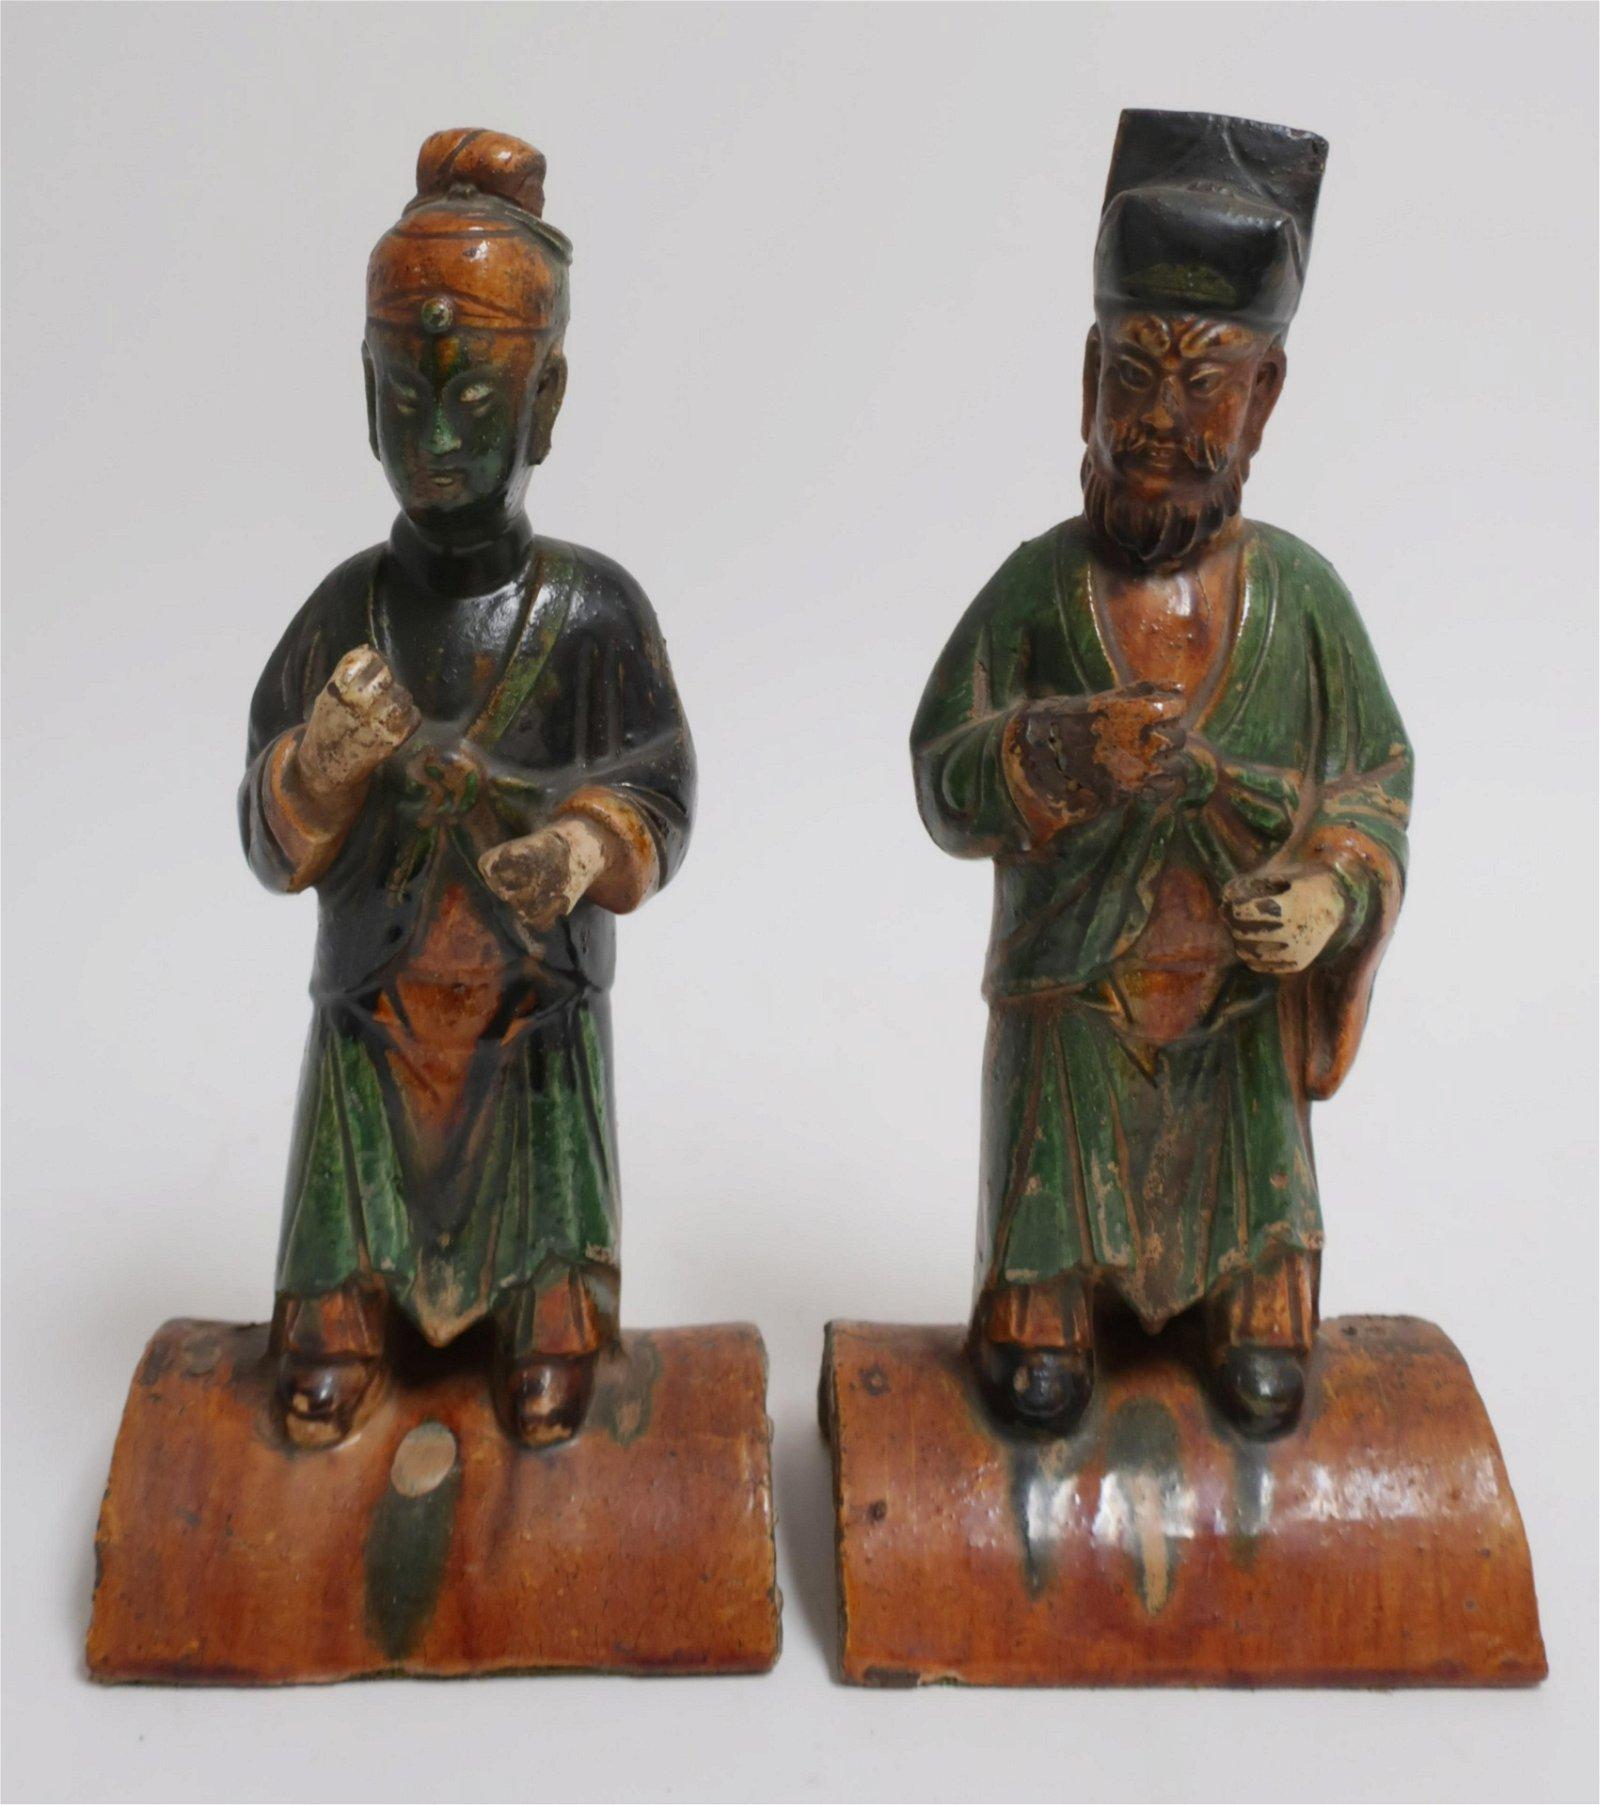 2 Ming Sancai Glazed Pottery Roof Tile Figures